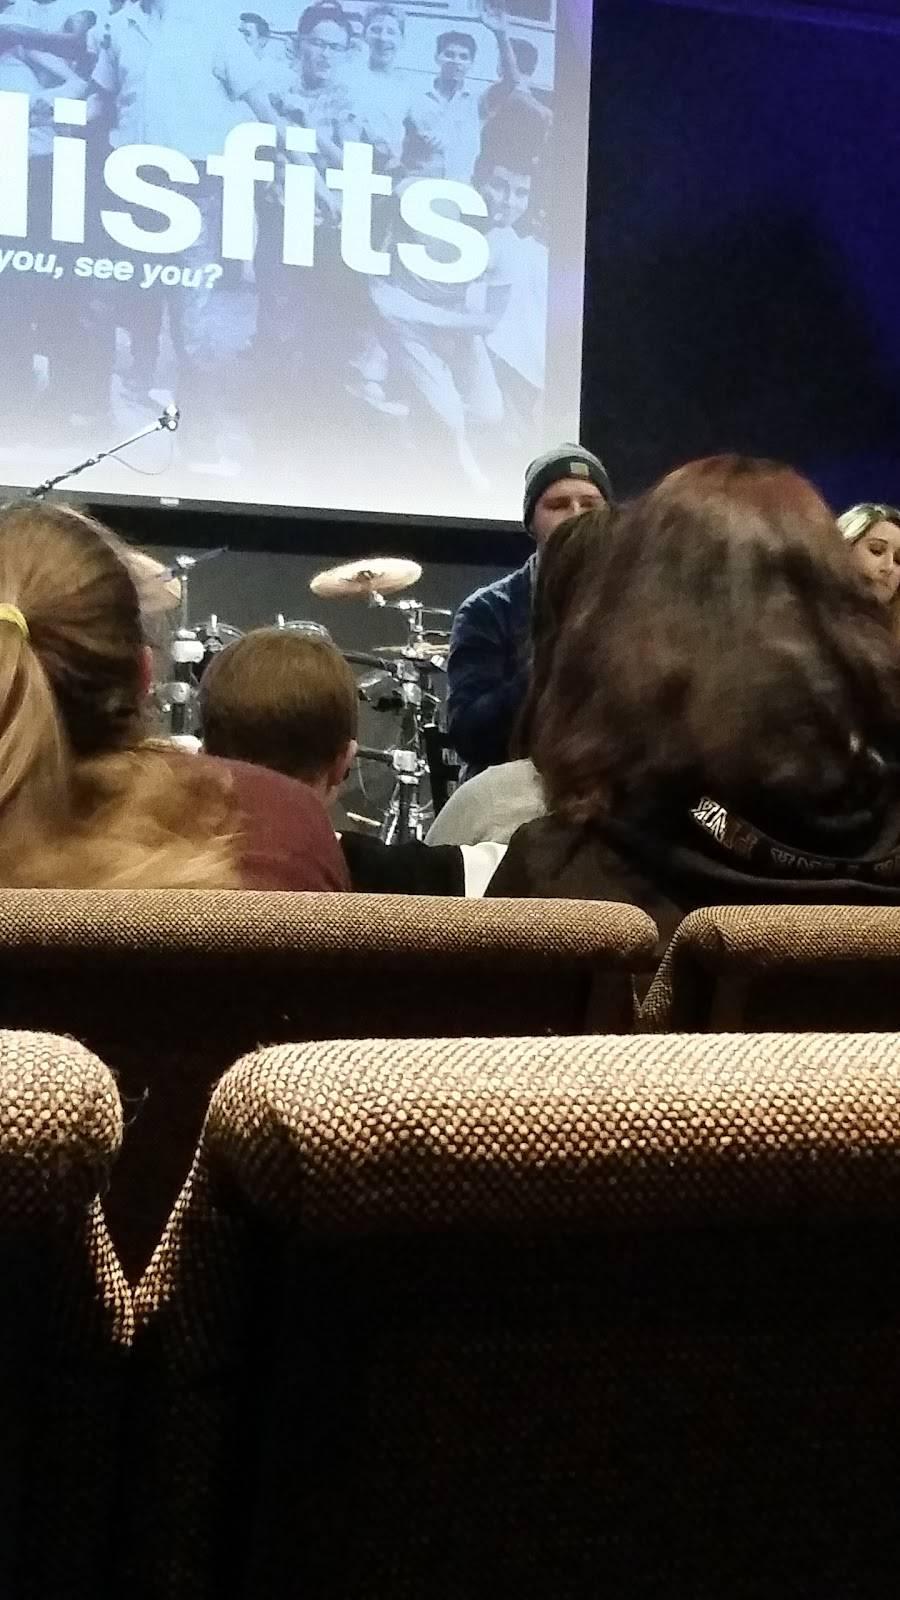 Life Christian Center - church  | Photo 6 of 7 | Address: 5497 SE International Way, Milwaukie, OR 97222, USA | Phone: (503) 656-5433